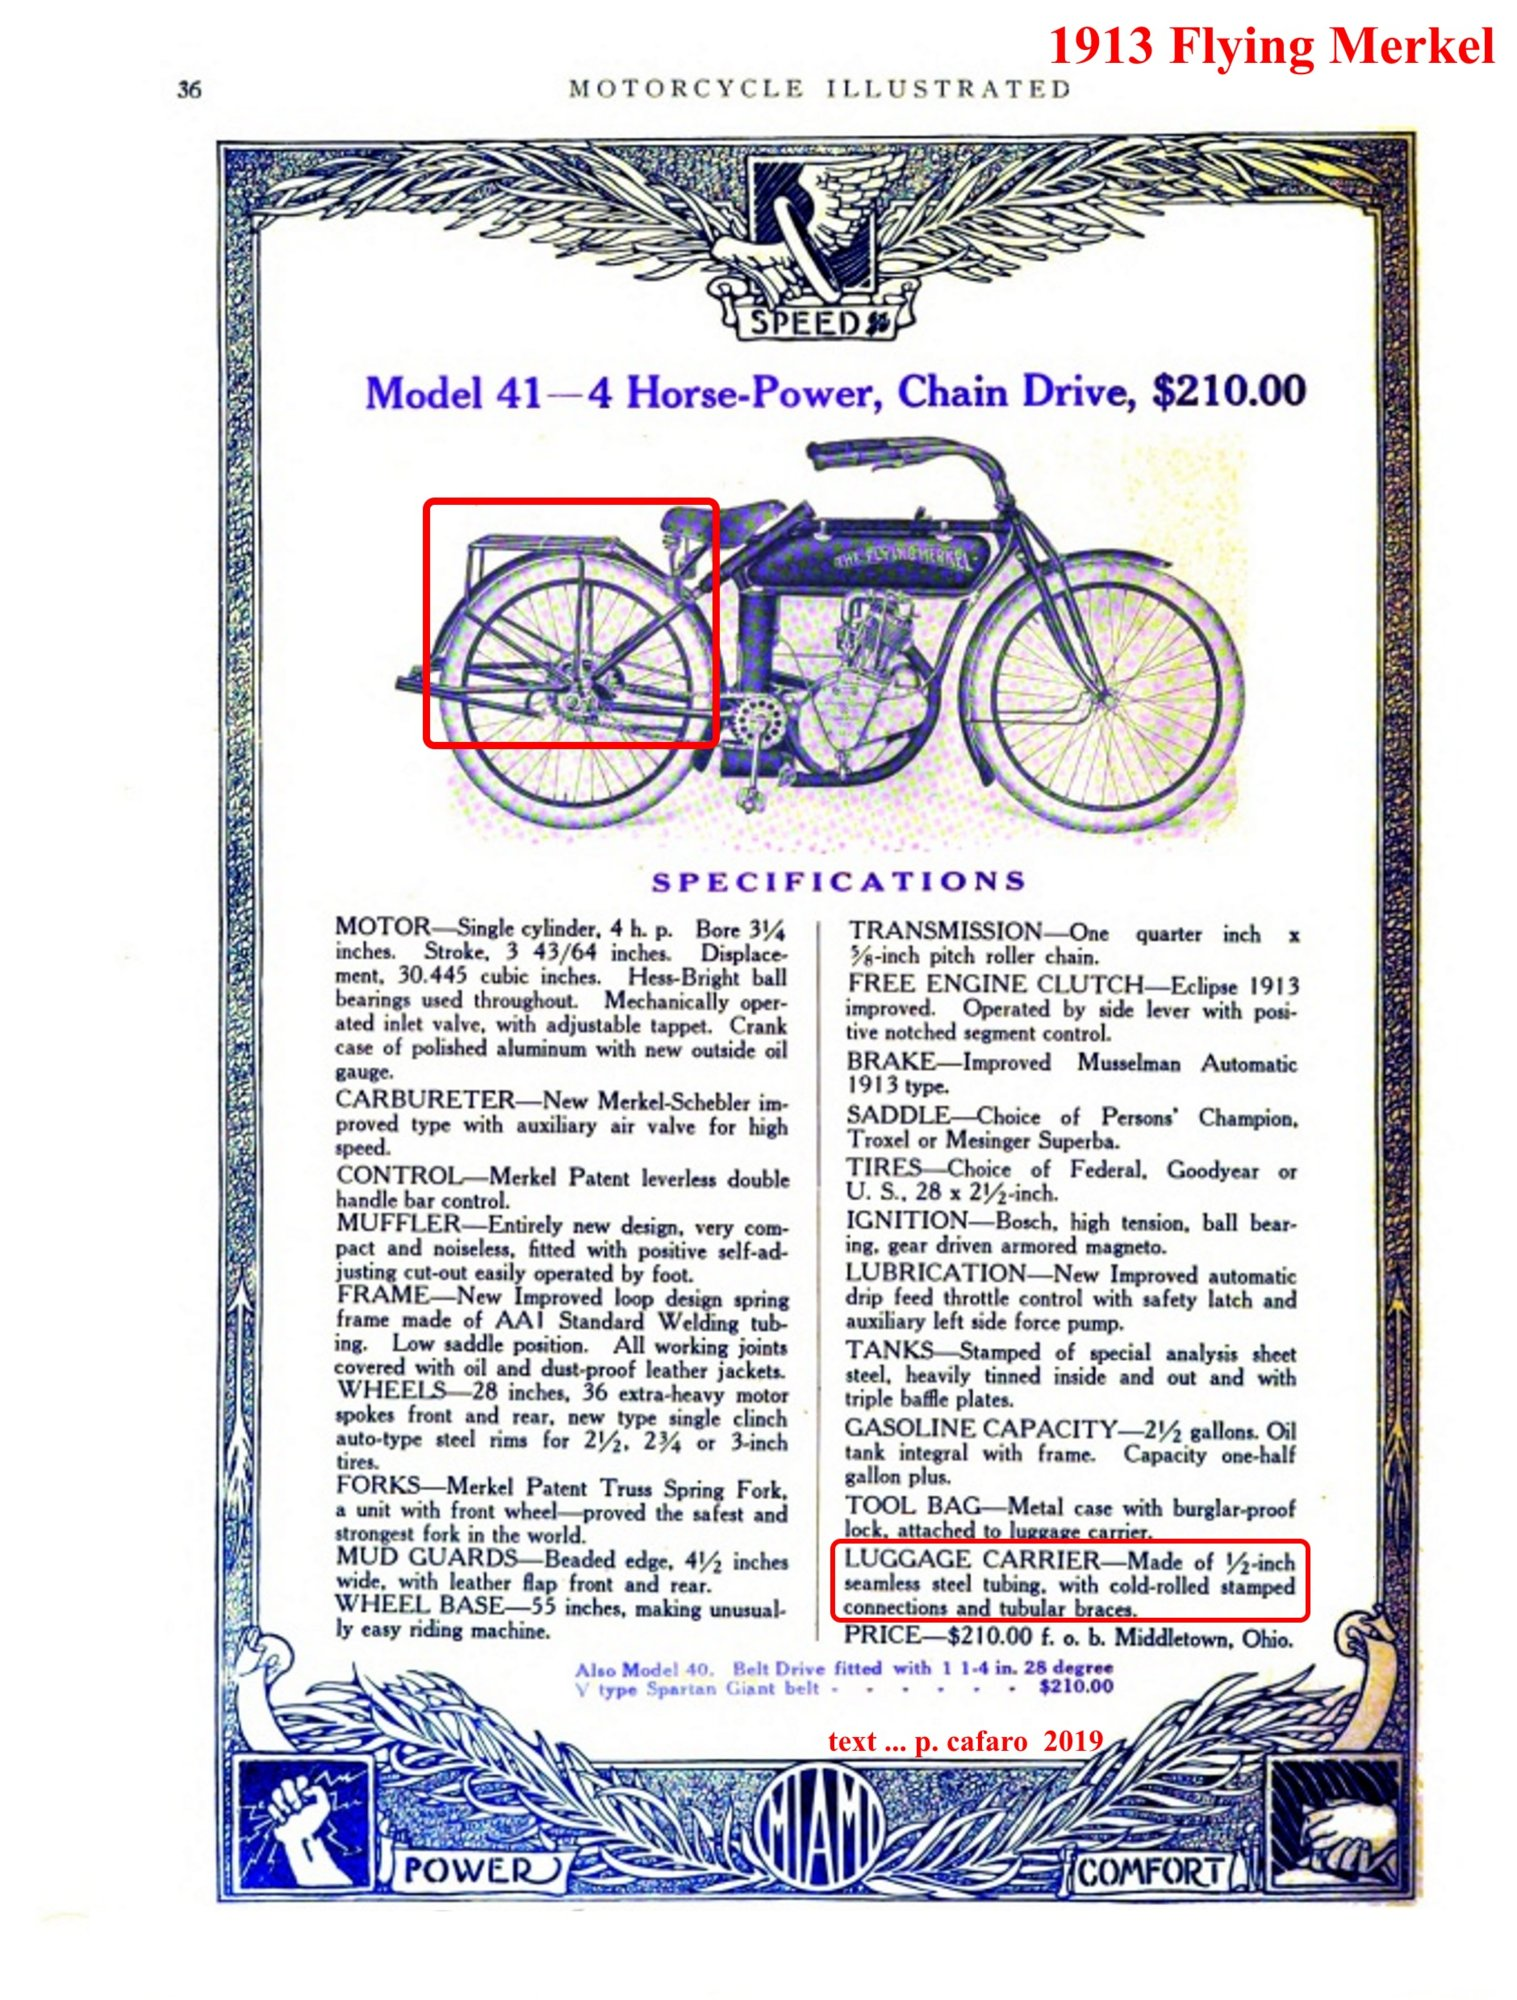 1913 f-m 05.jpg